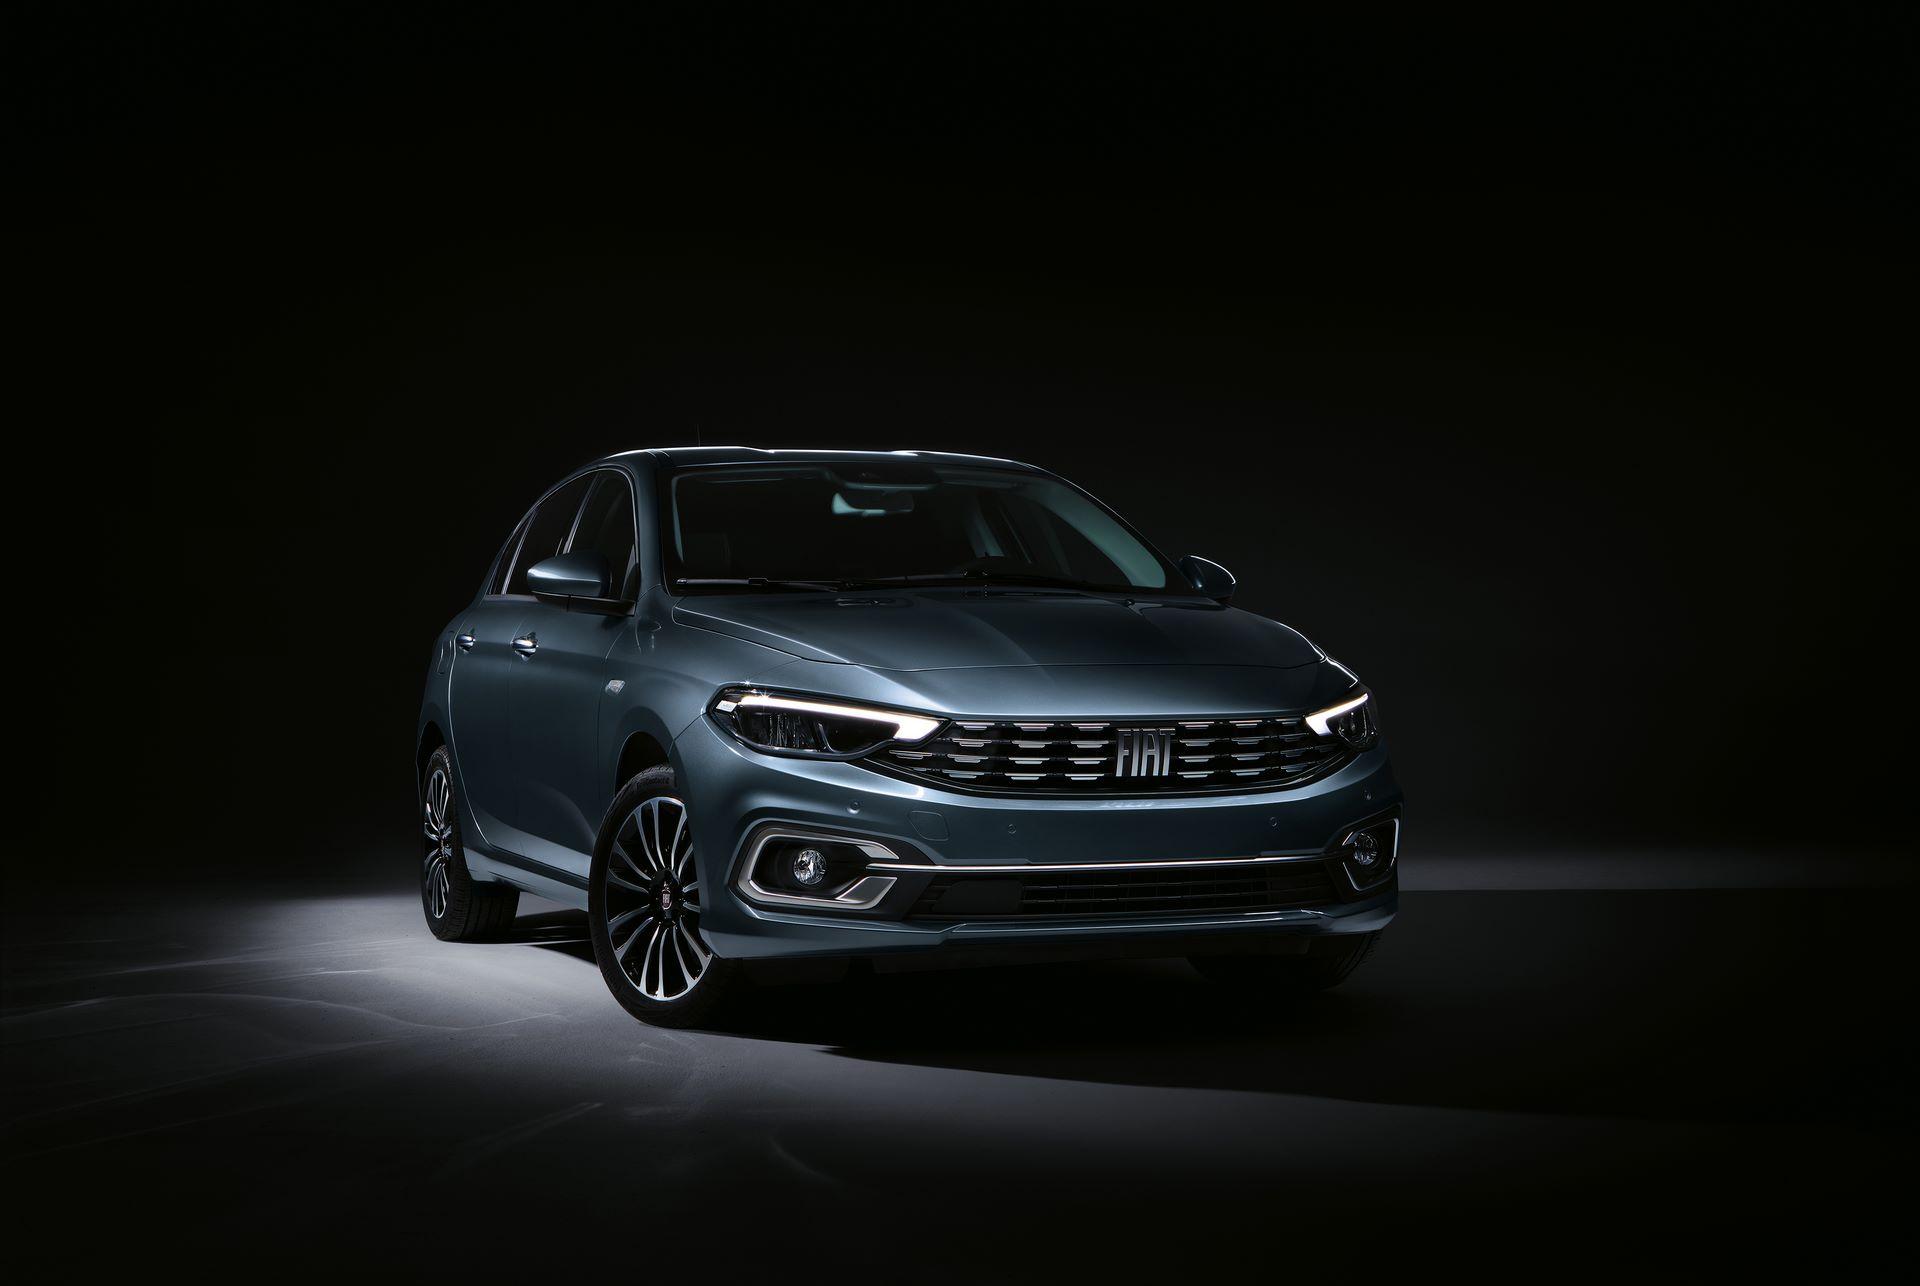 Fiat Tipo (2021): lifting